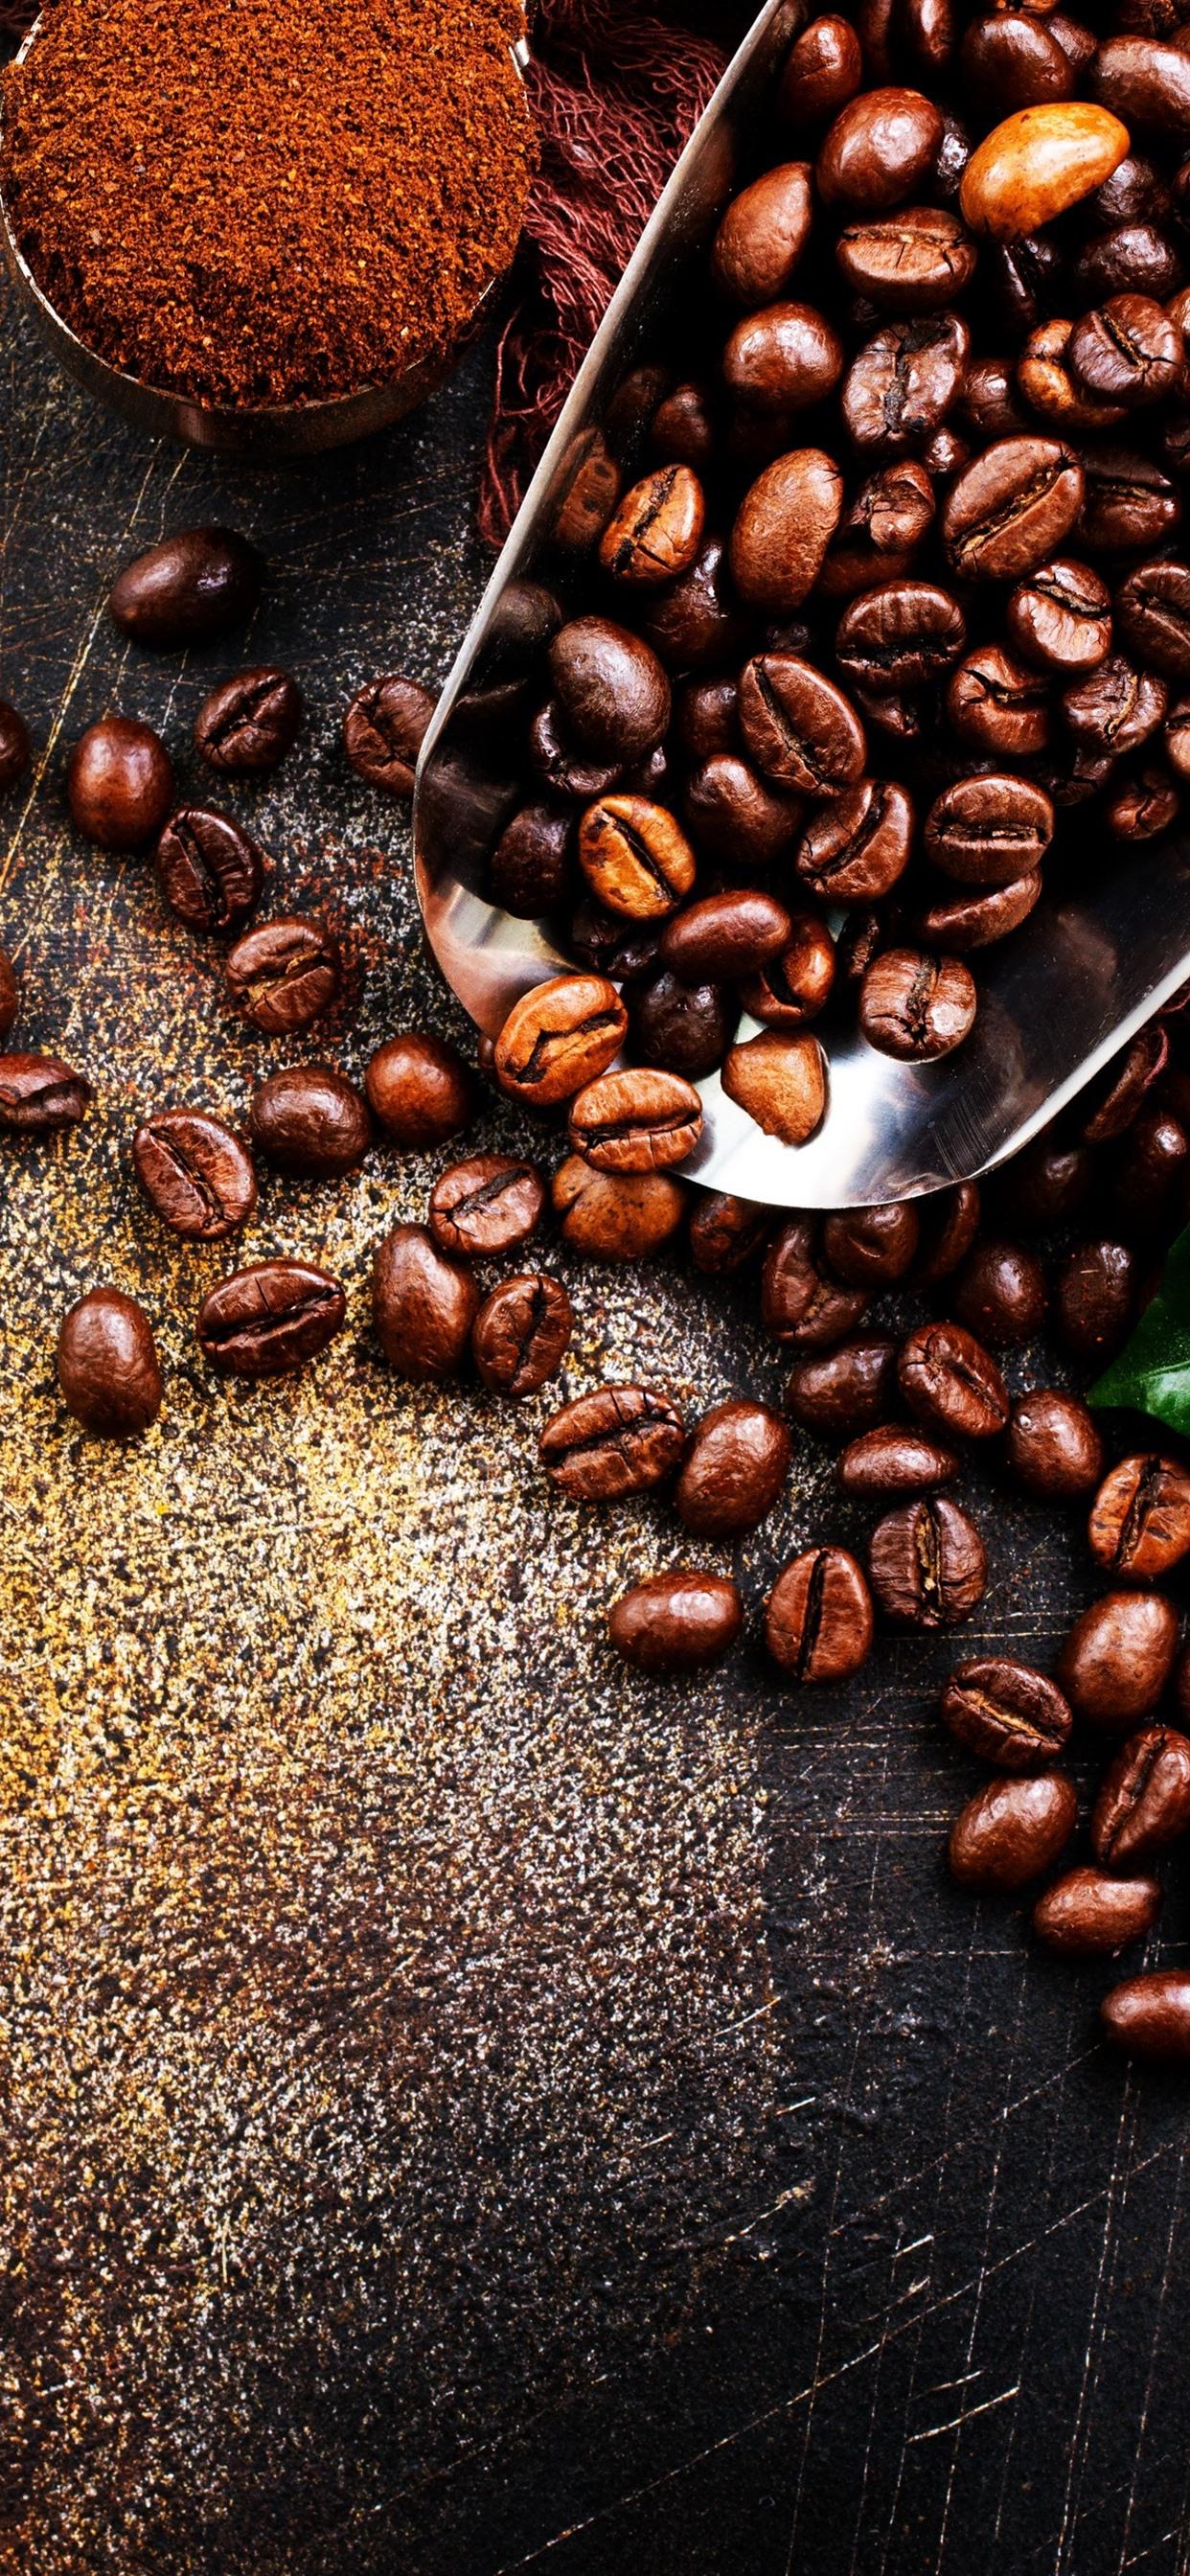 Coffee Beans Green Leaf Powder 1242x2688 Iphone Xs Max